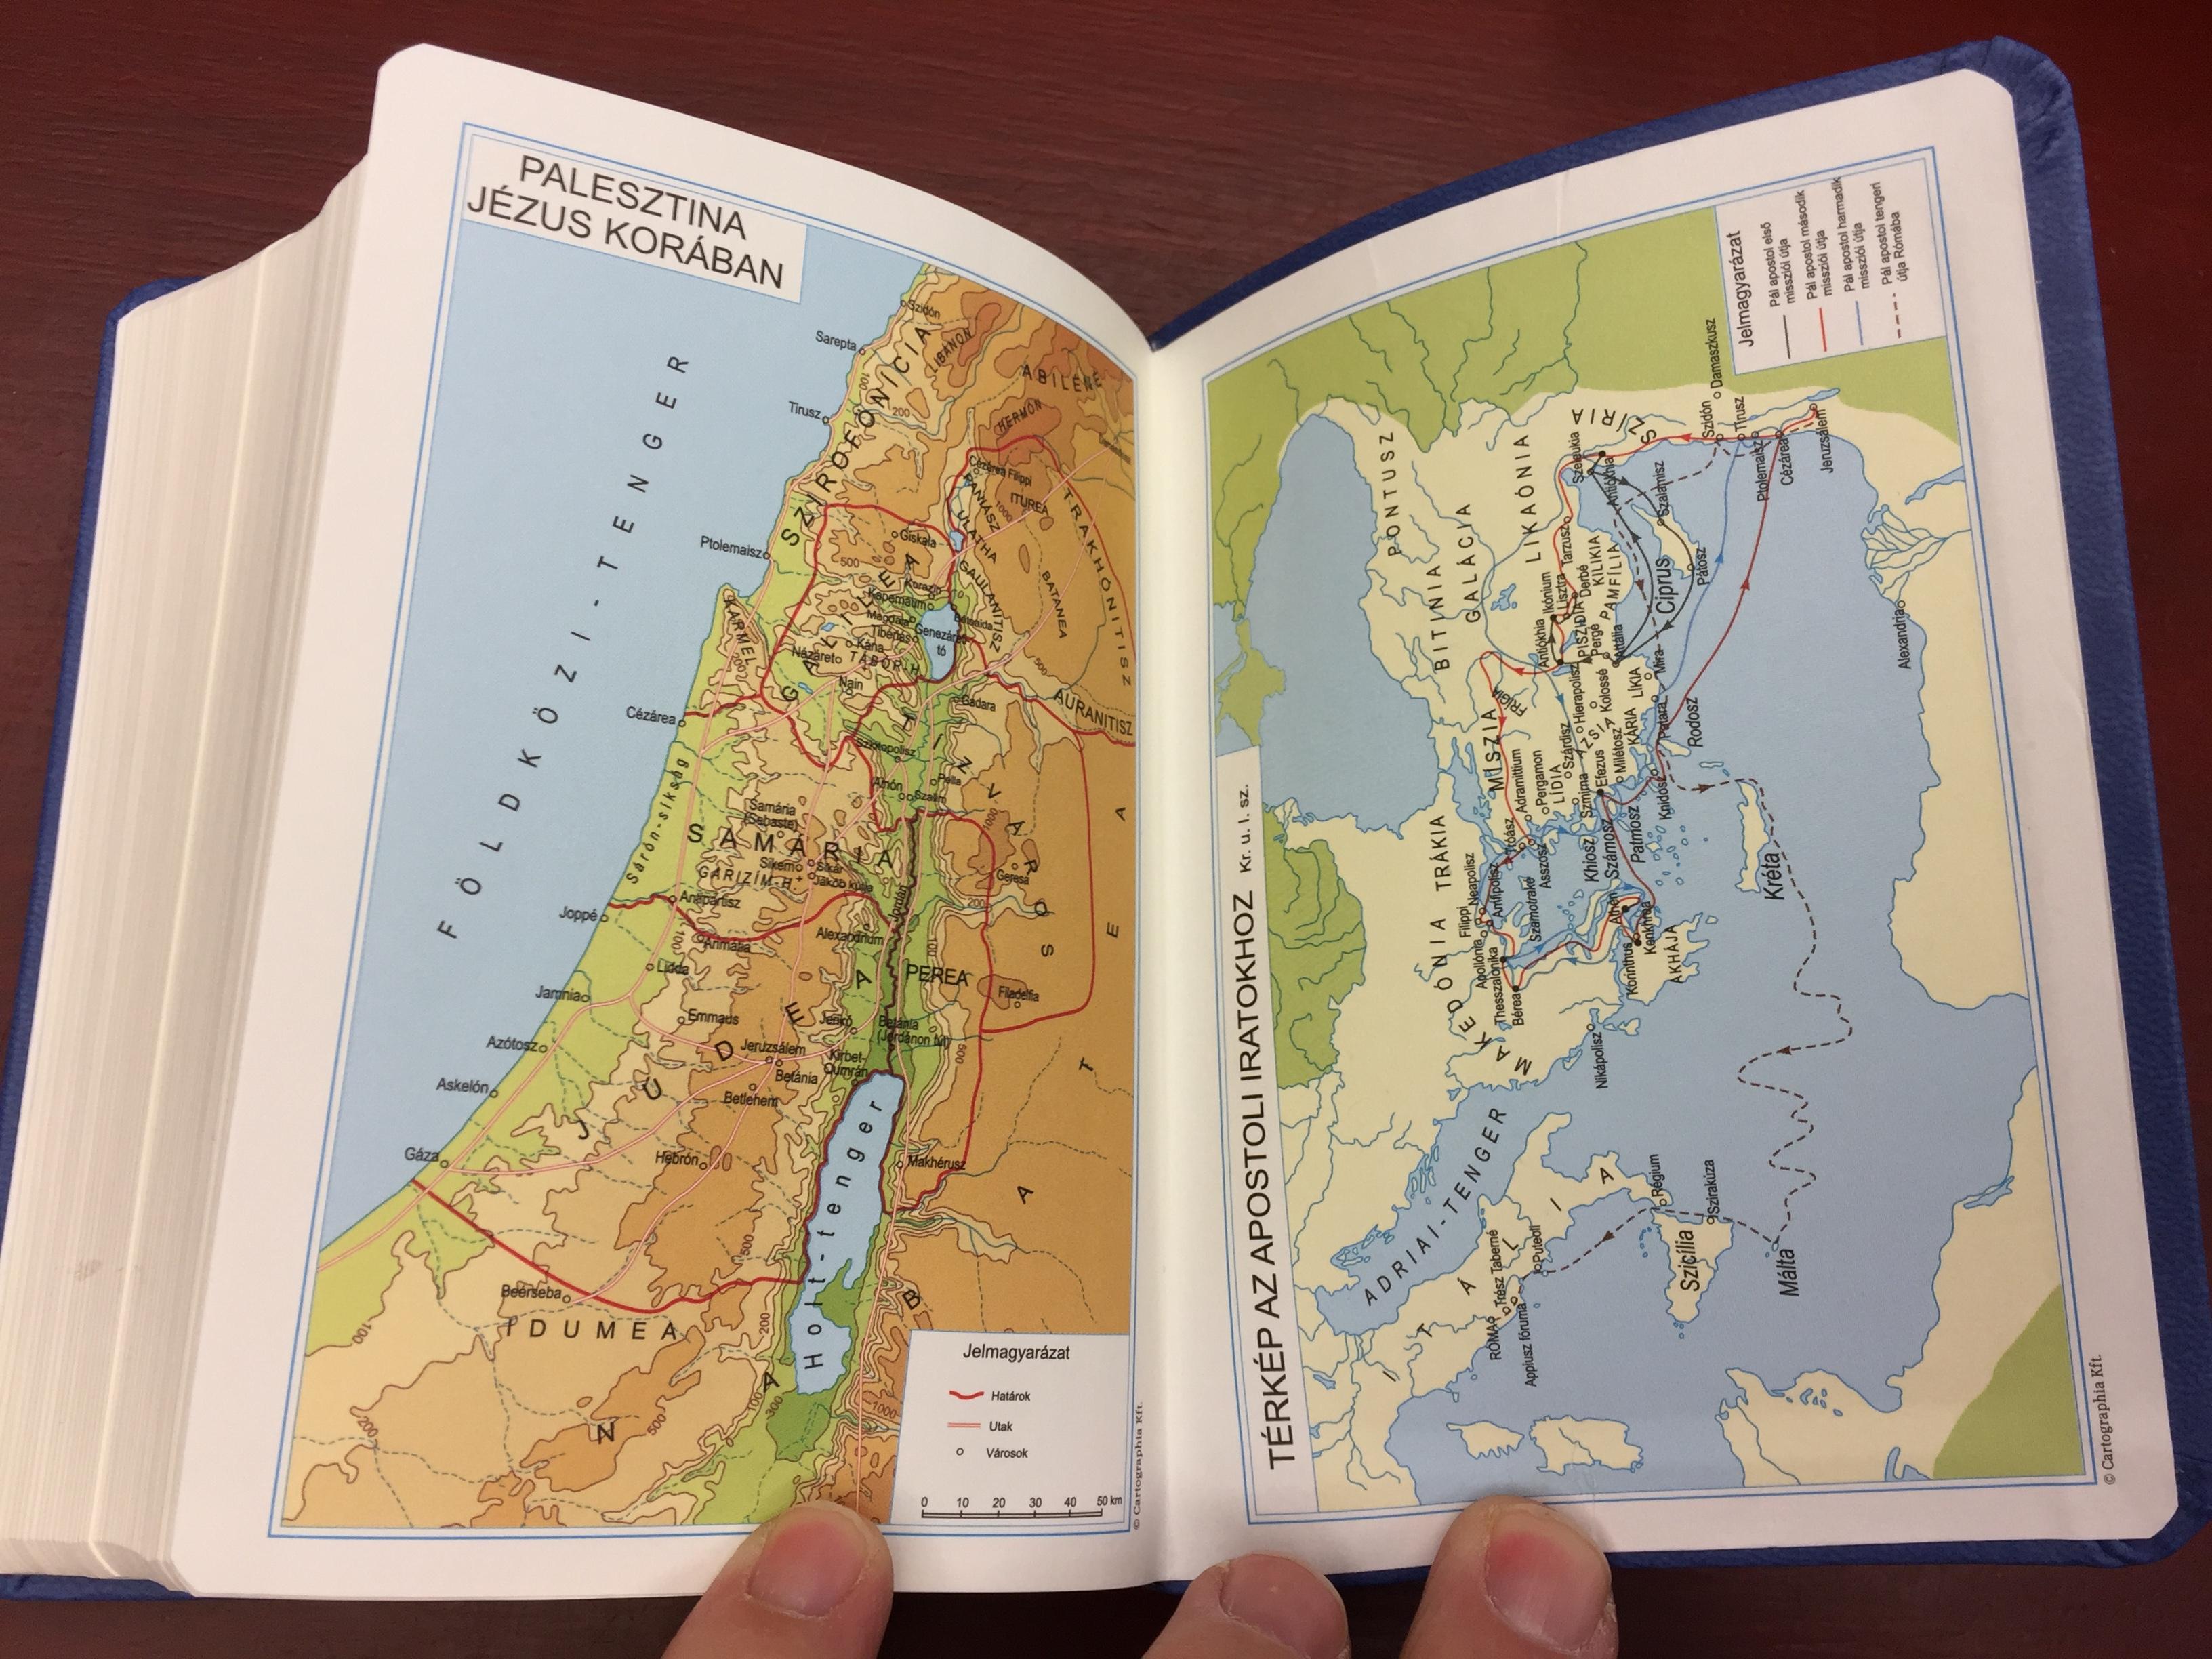 biblia-r-f-hungarian-revised-translation-pocket-size-holy-bible-7.jpg